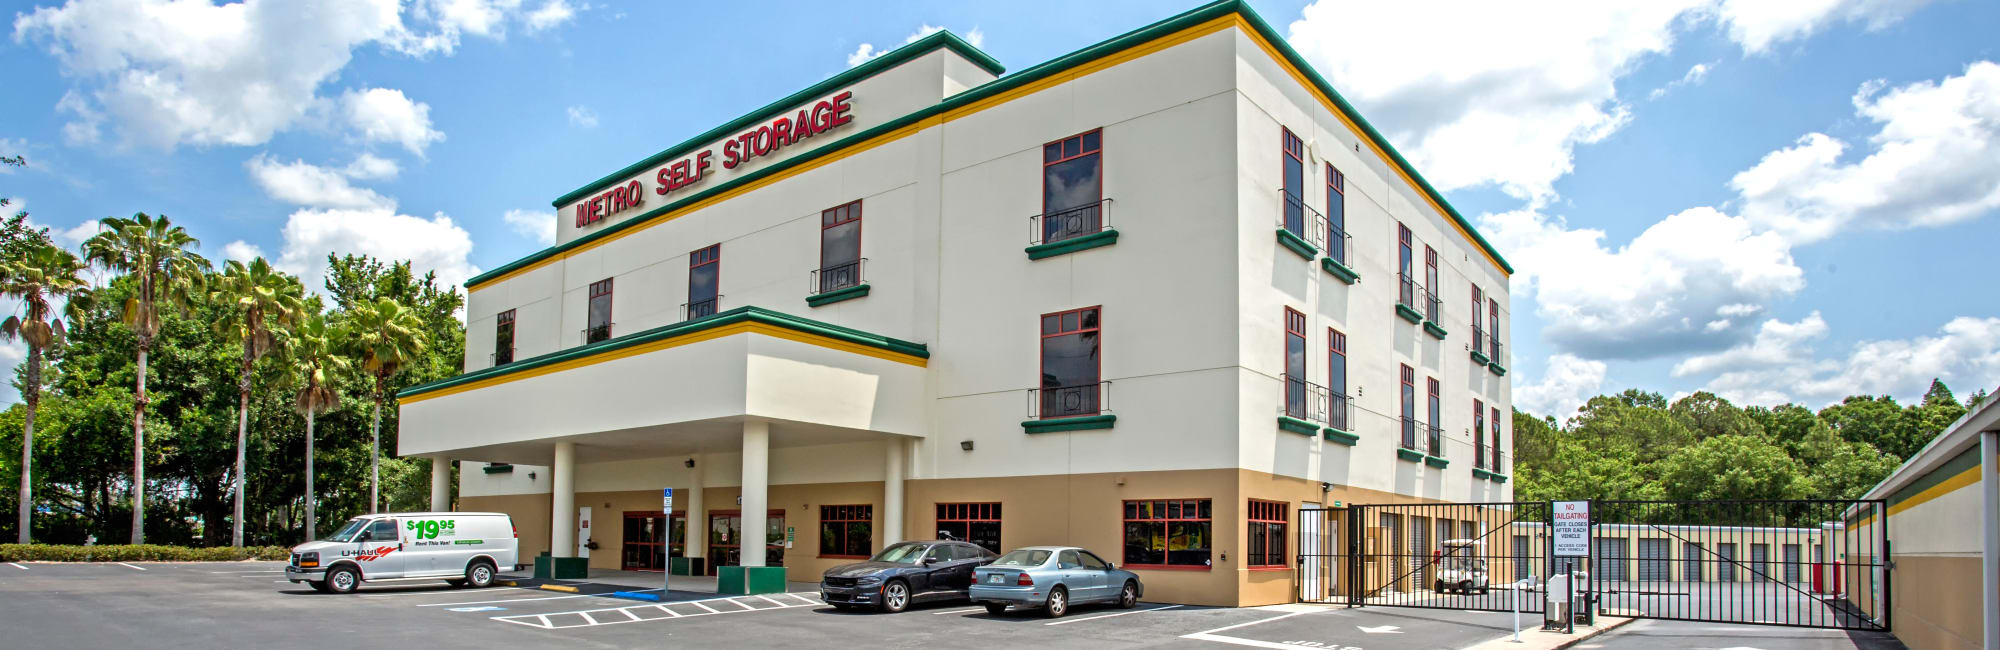 Self storage in Tampa FL